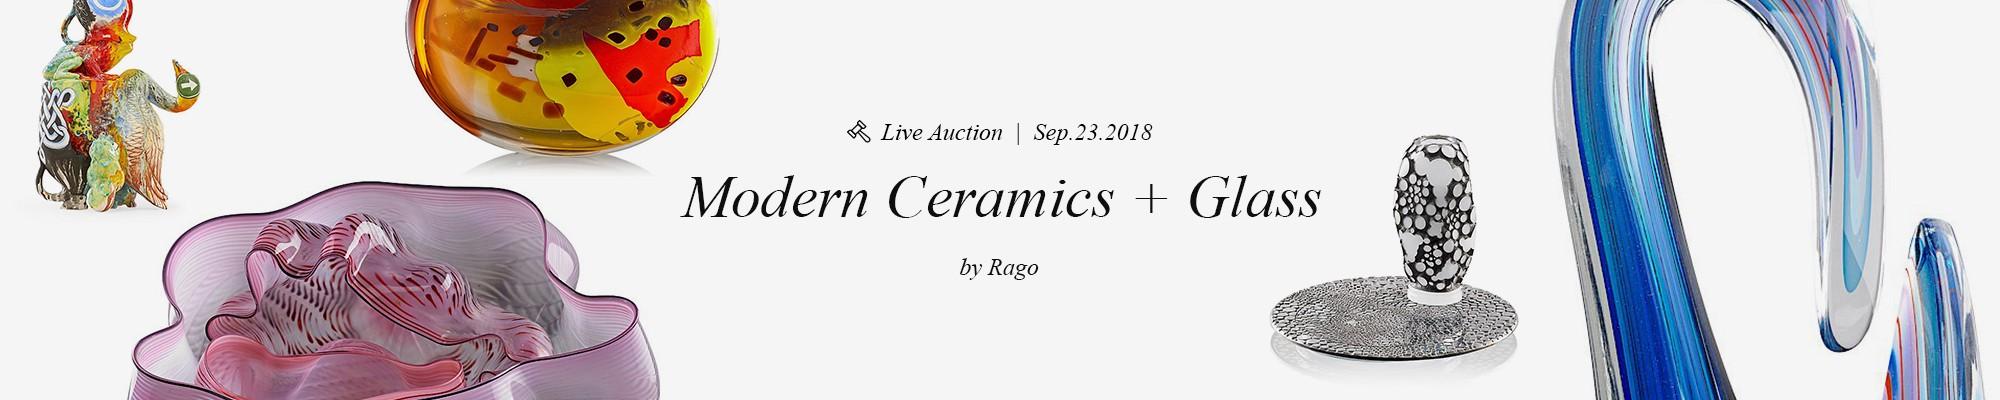 modern-ceramics-glass-rago